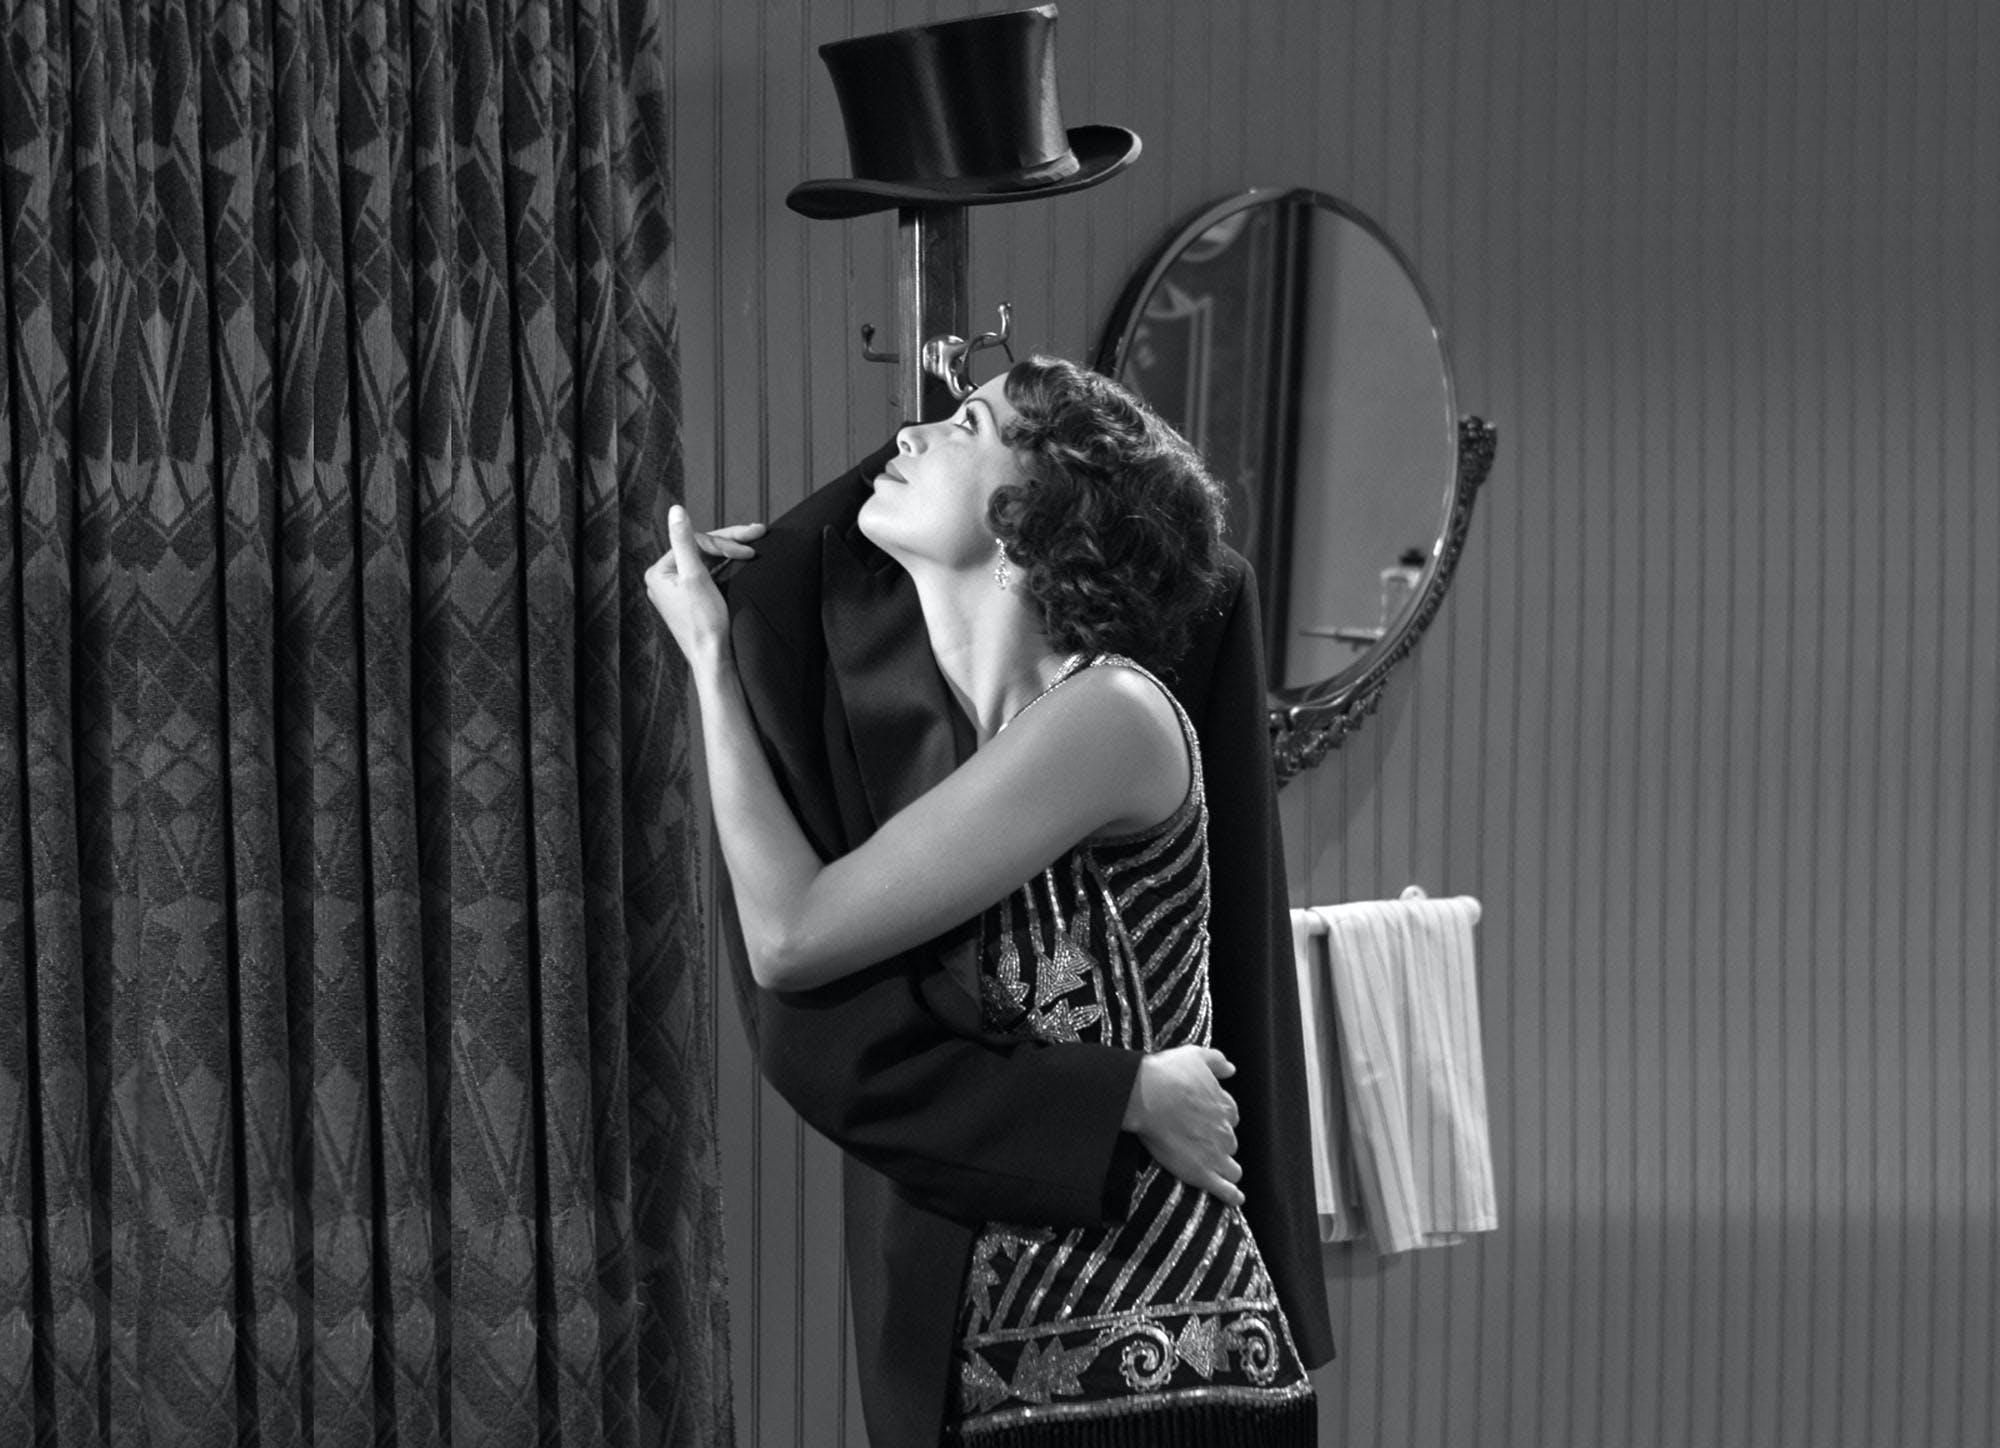 Michel Hazanavicius: The Artist